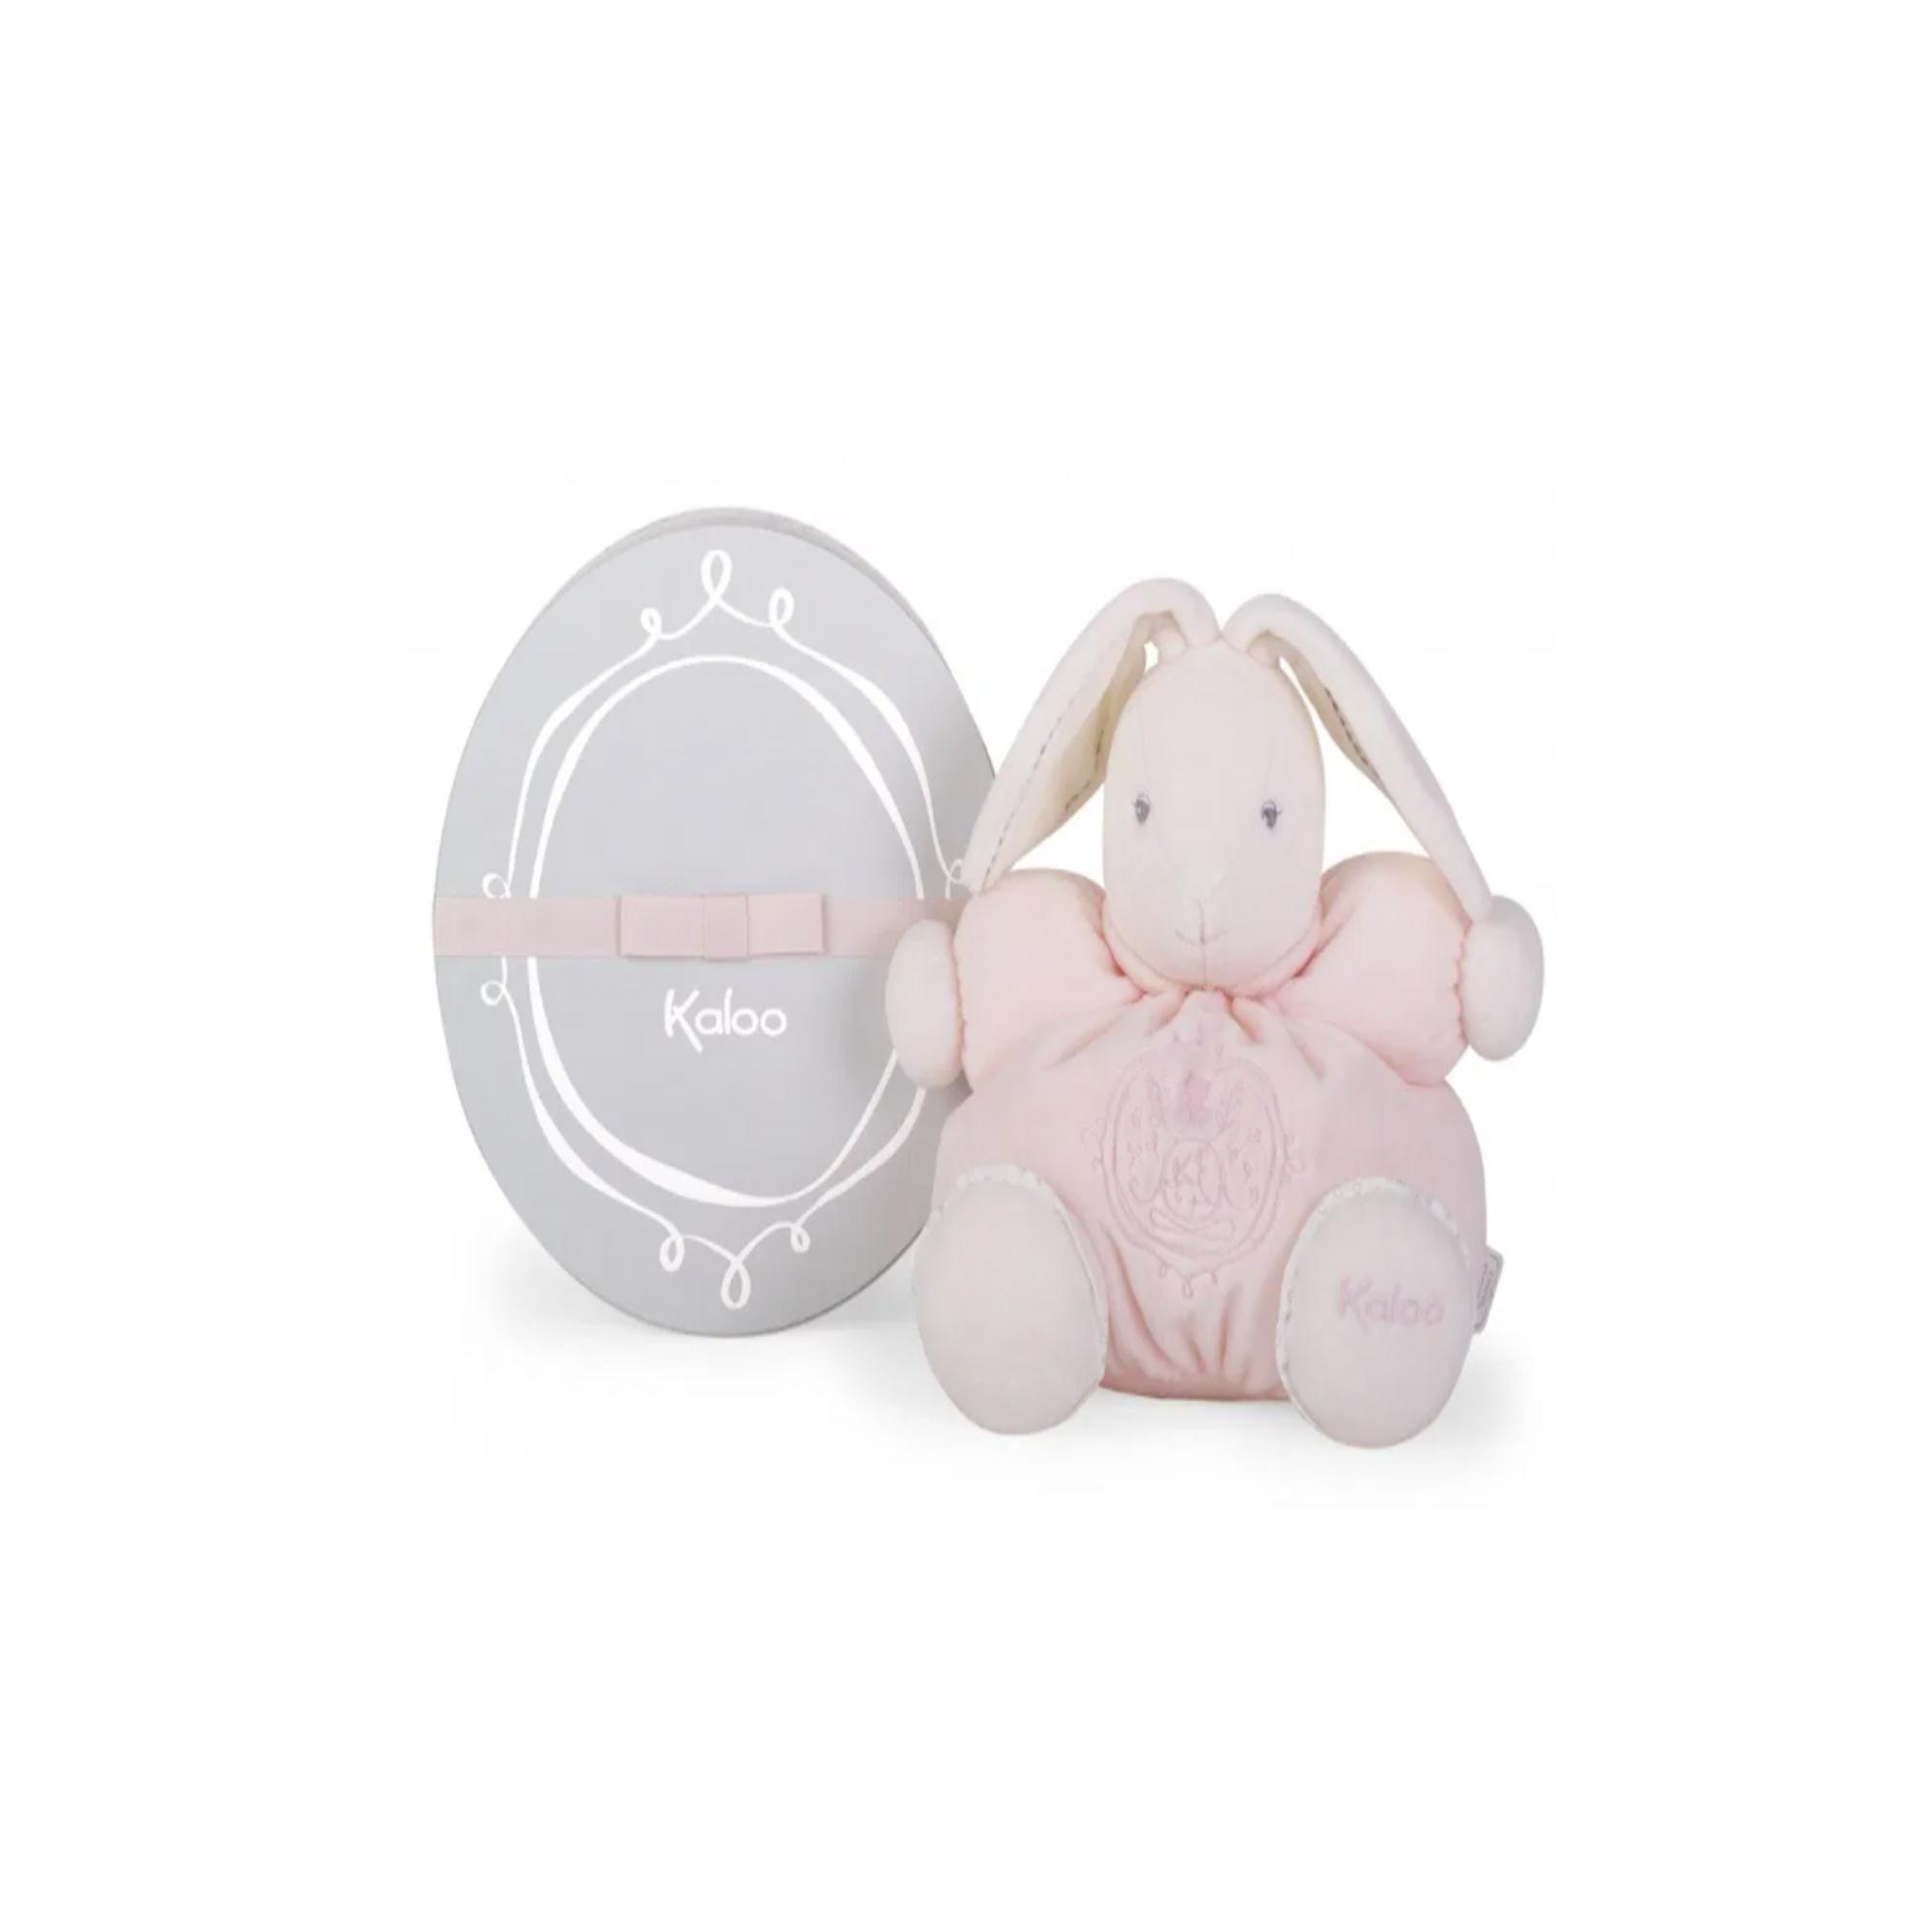 Kaloo Perle Chubby Rabbit Pink Medium